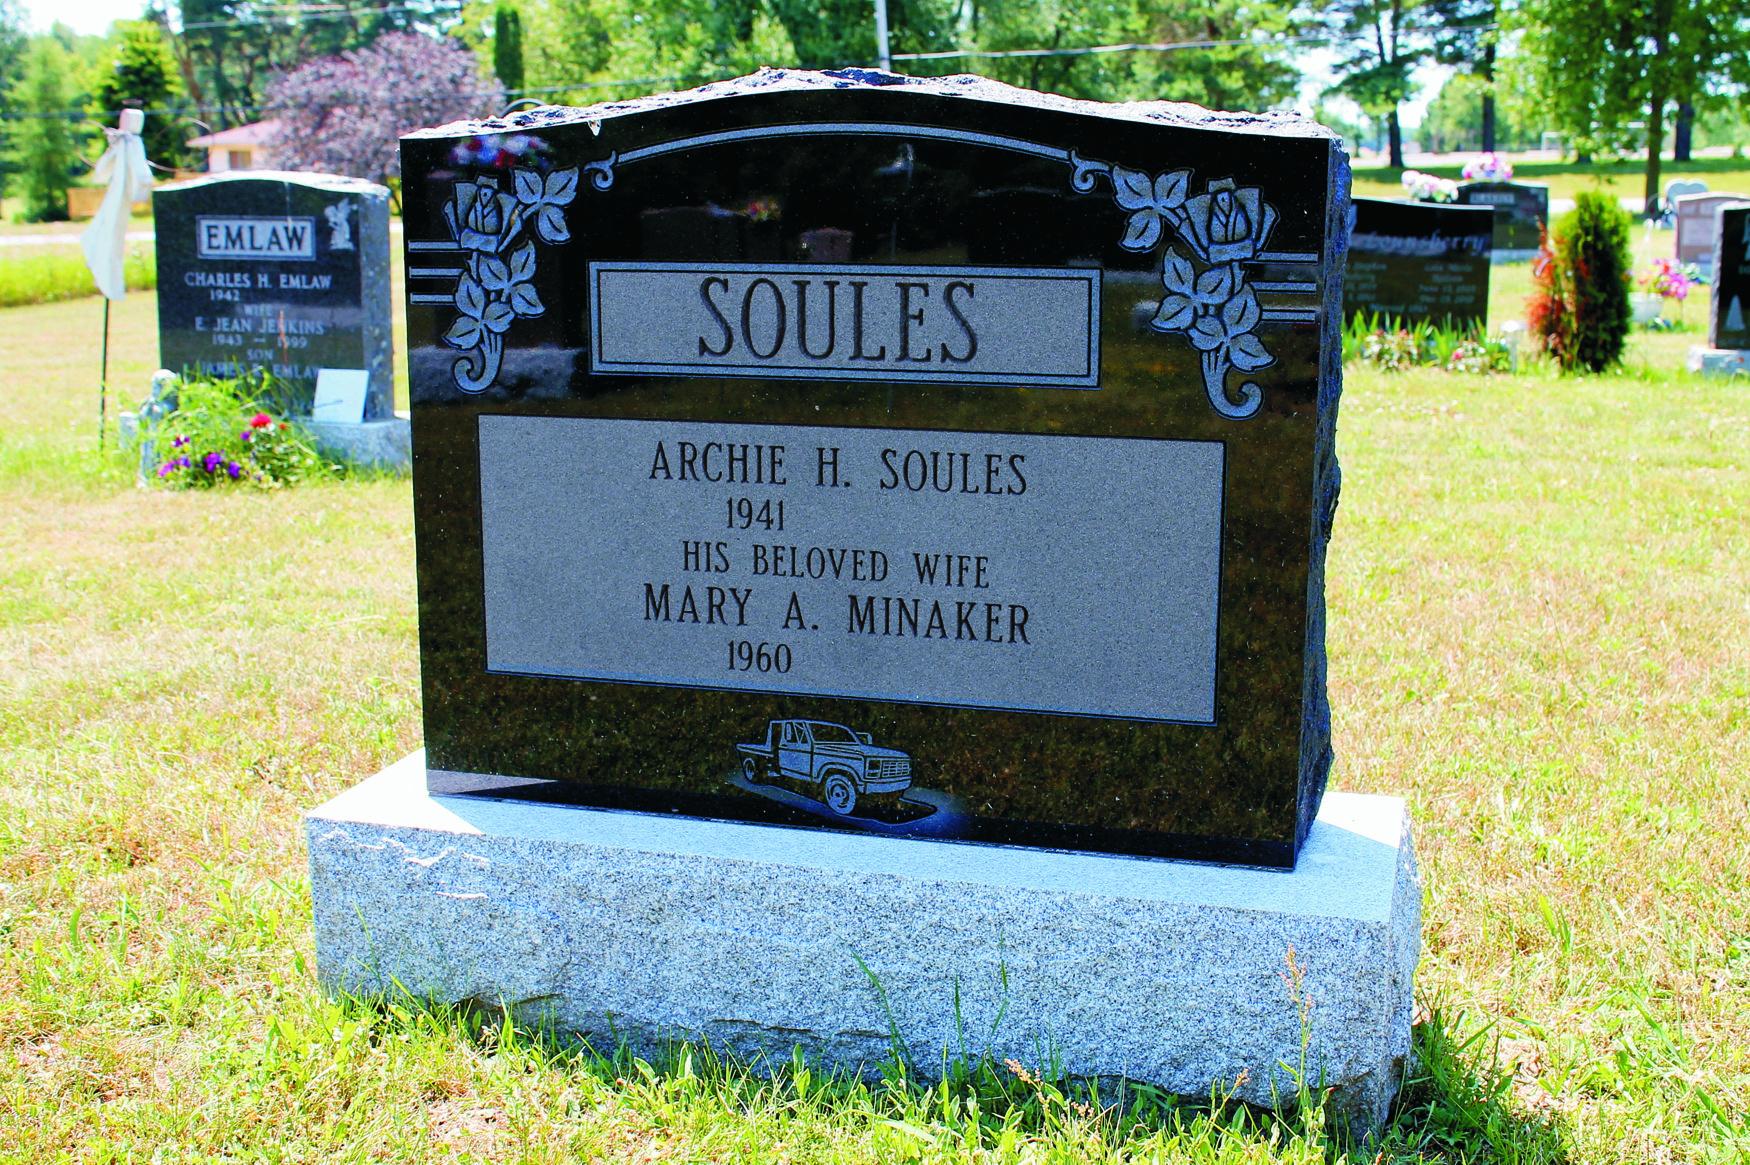 Soules